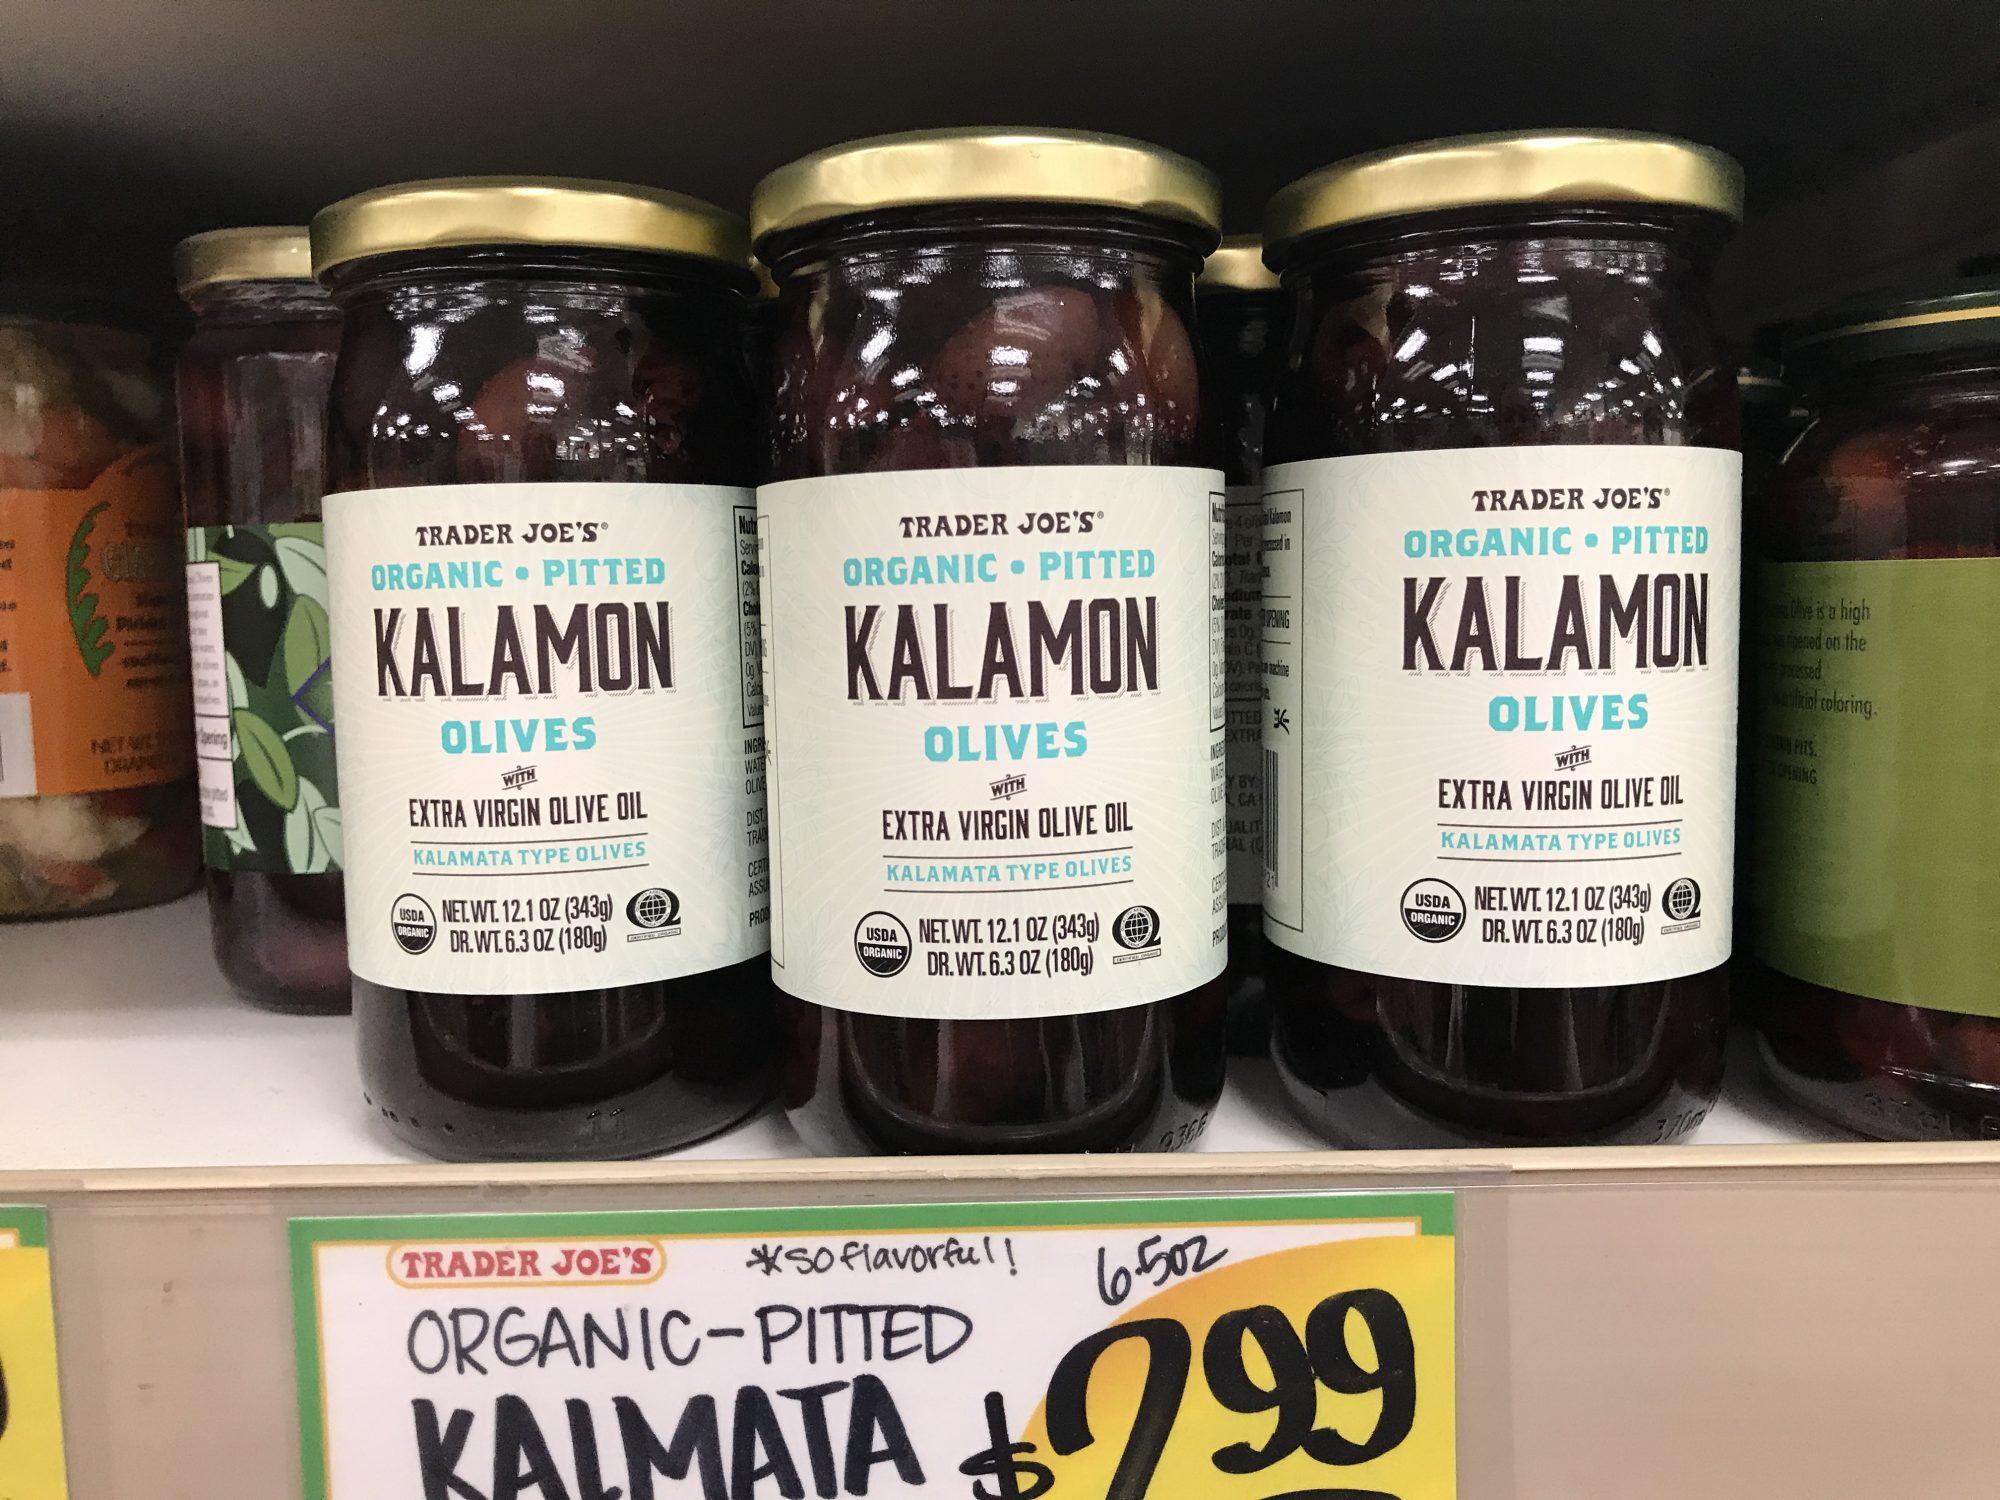 TJ Kalamata Olives